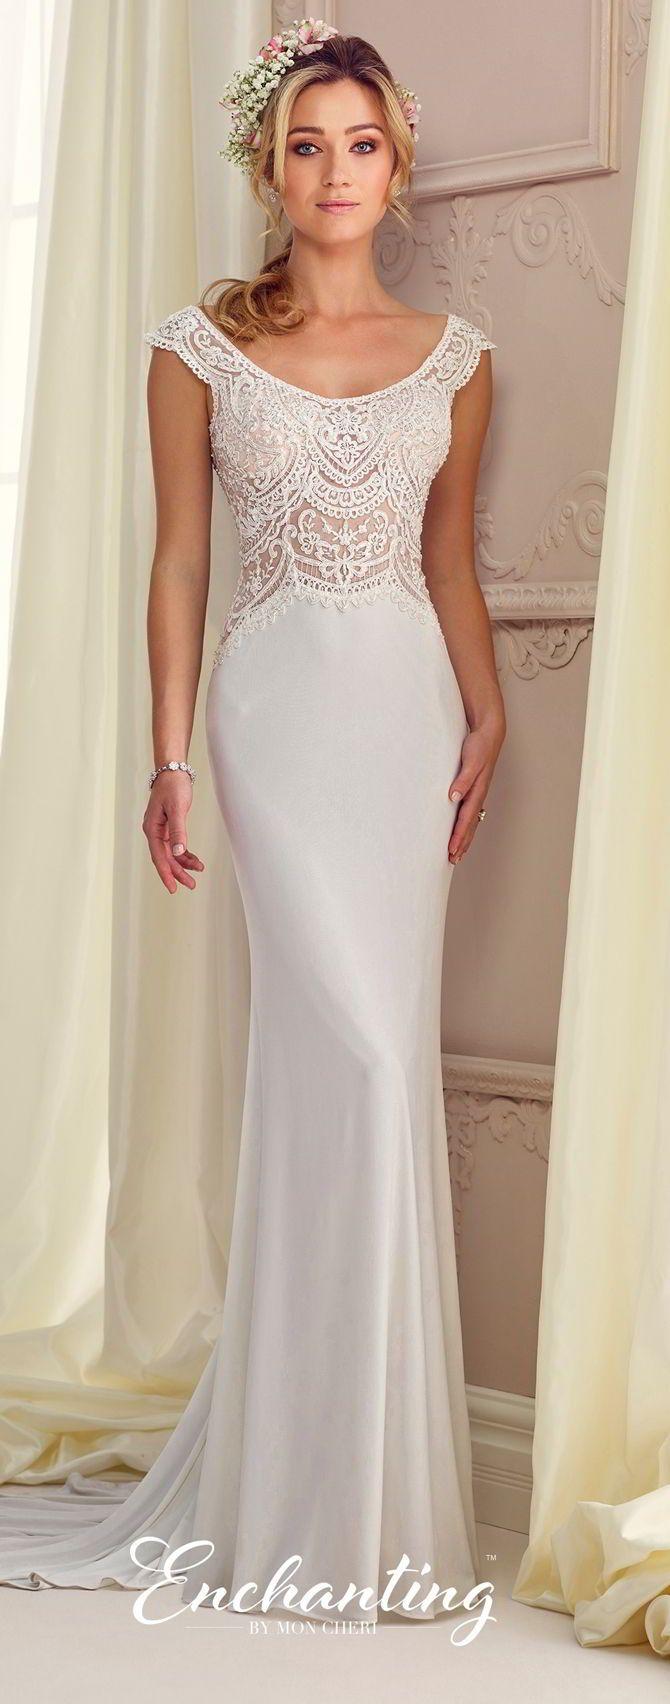 best bride images on pinterest wedding dress wedding frocks